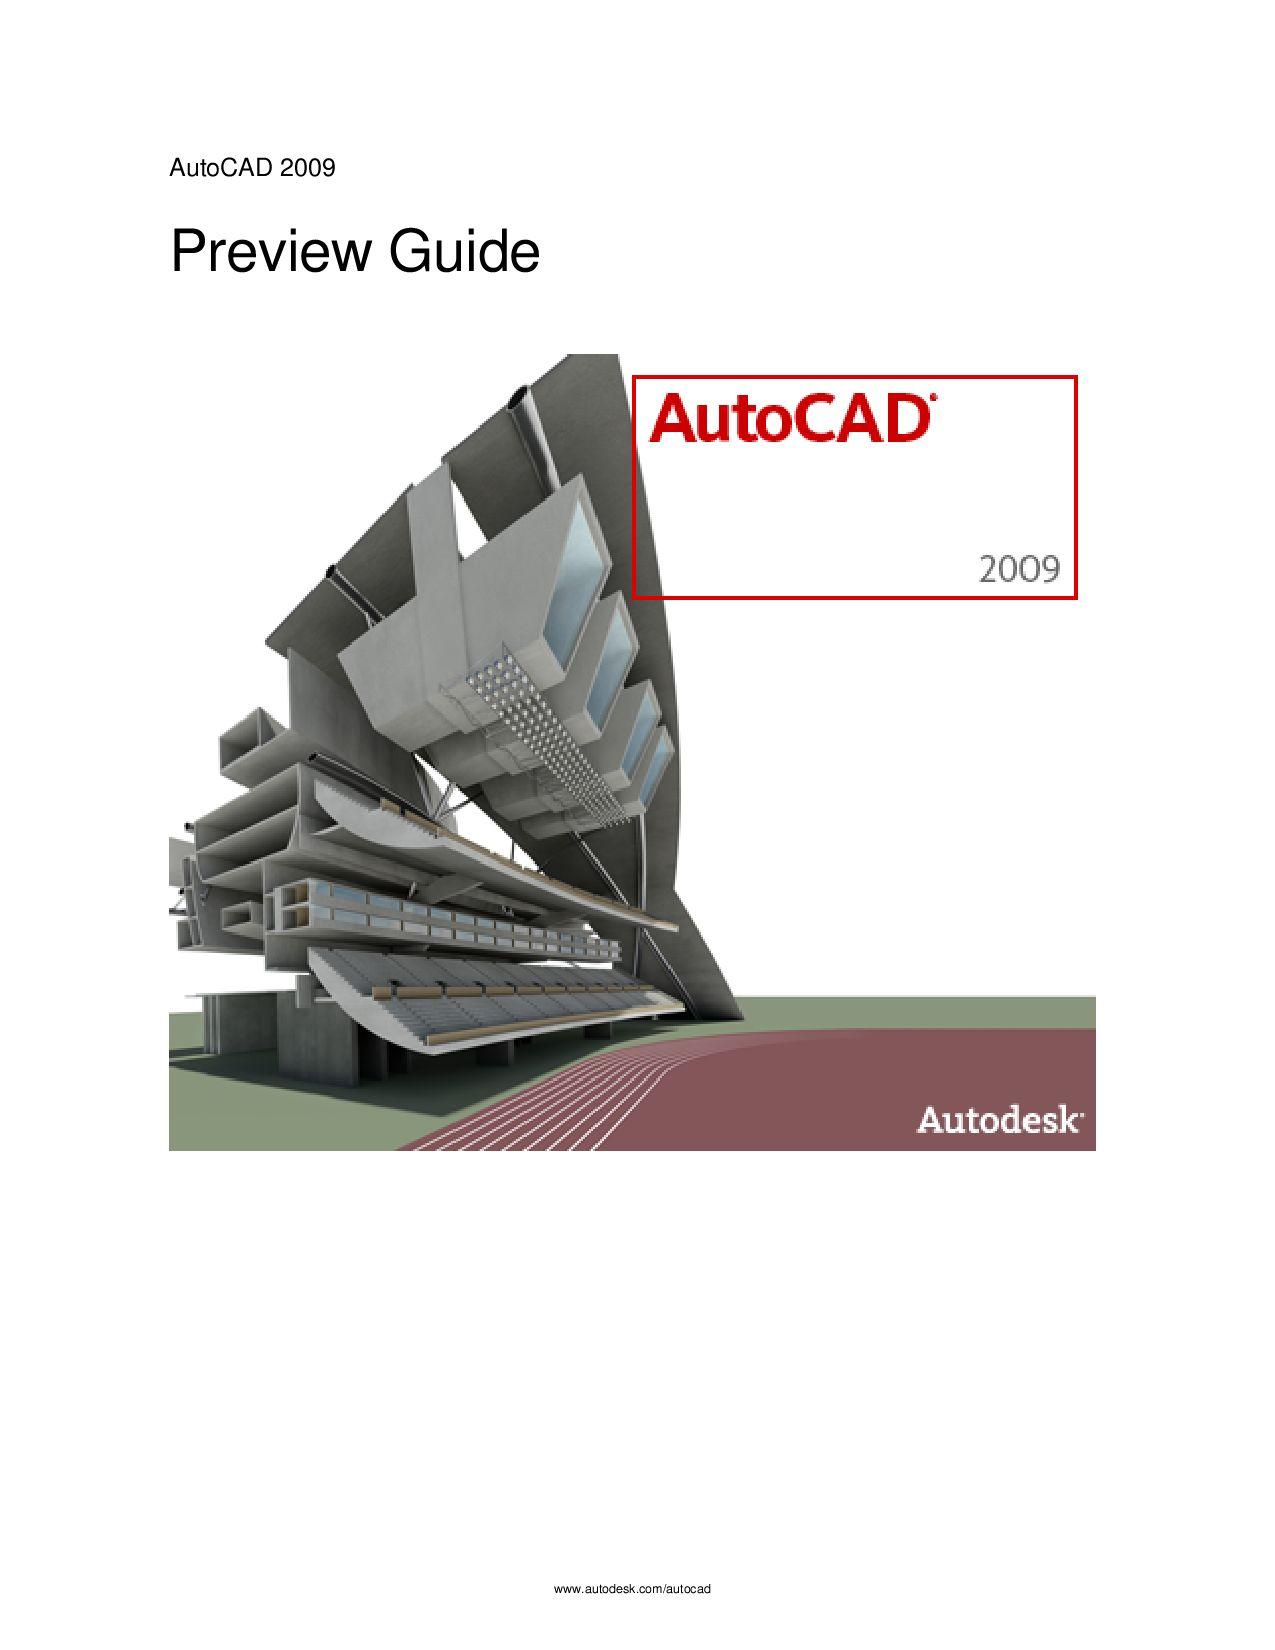 autocad 2009 prewiew guide final by gest issuu rh issuu com AutoCAD 2010 AutoCAD 2007